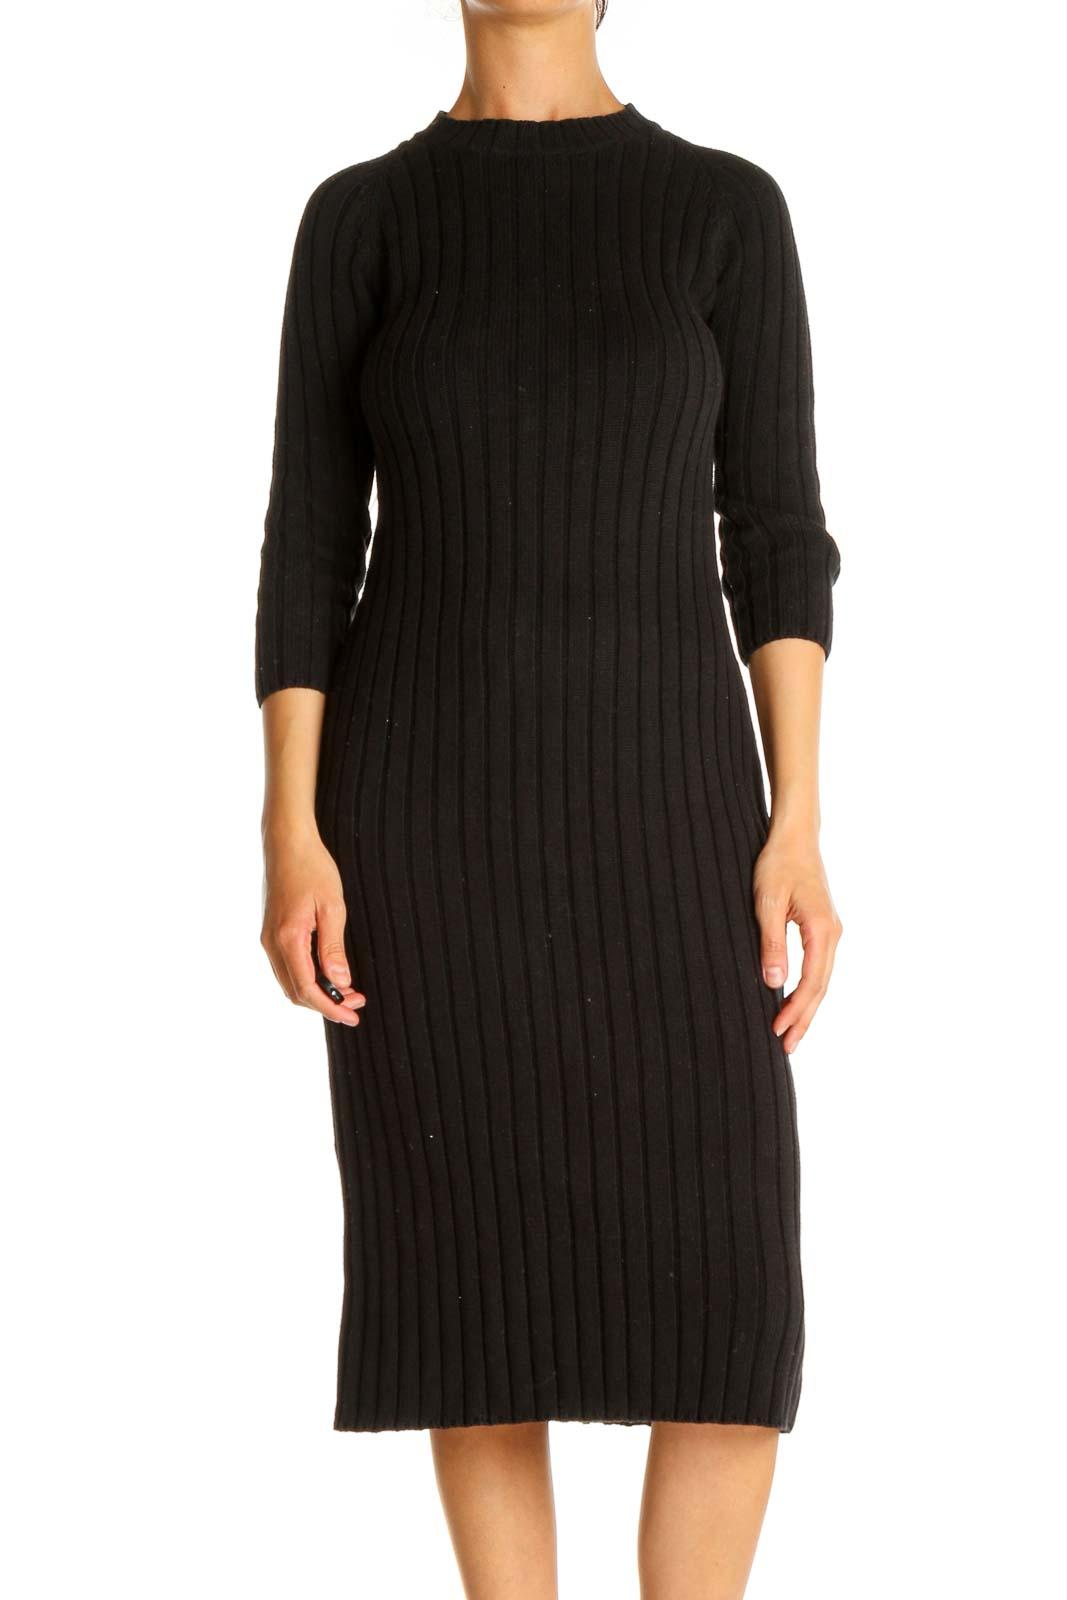 Black Textured Day Sheath Dress Front